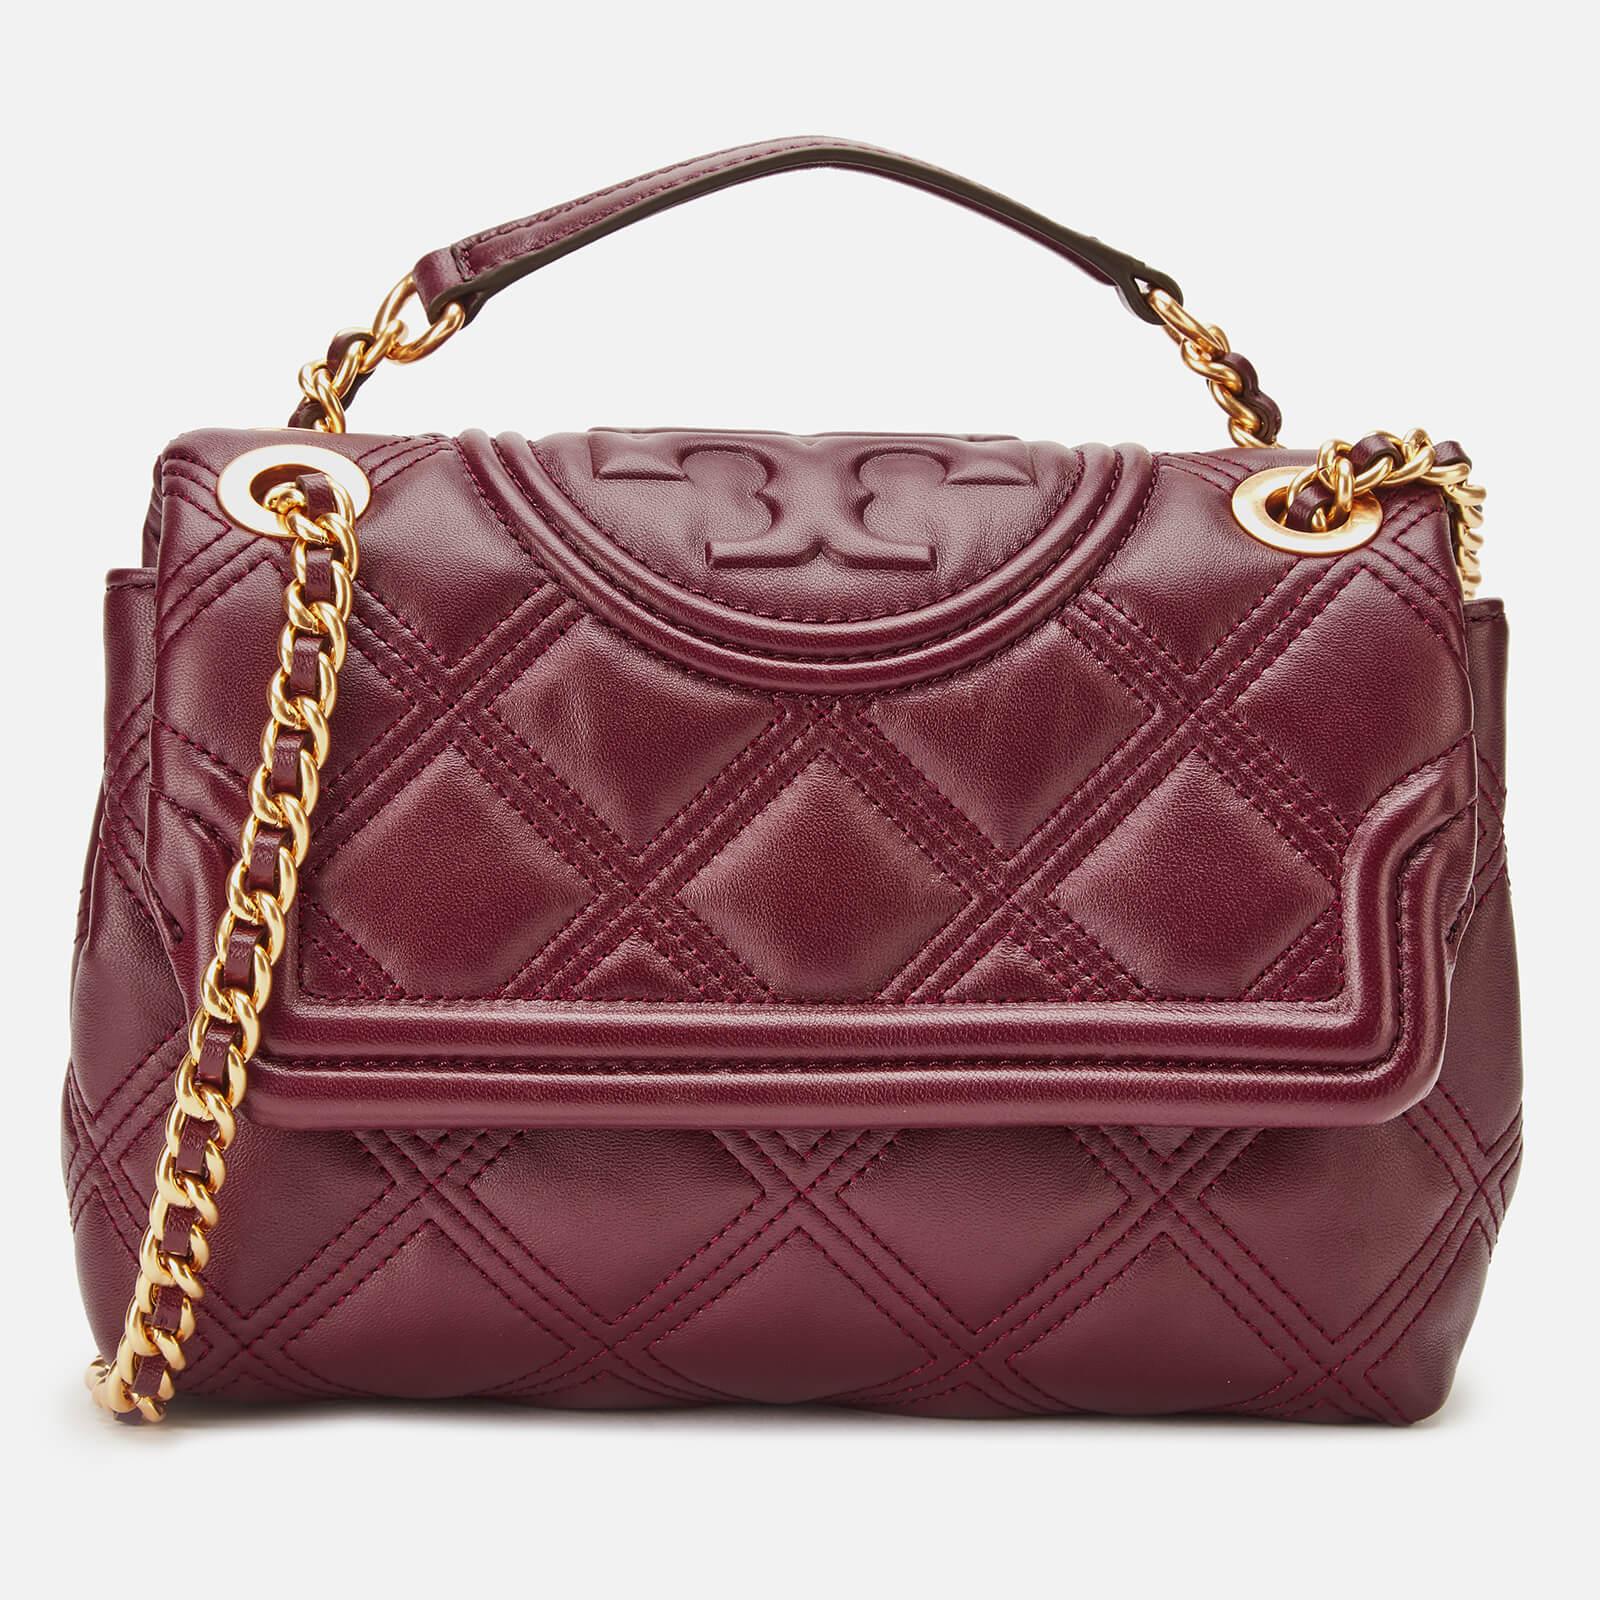 Tory Burch Women's Fleming Soft Small Convertible Shoulder Bag - Claret